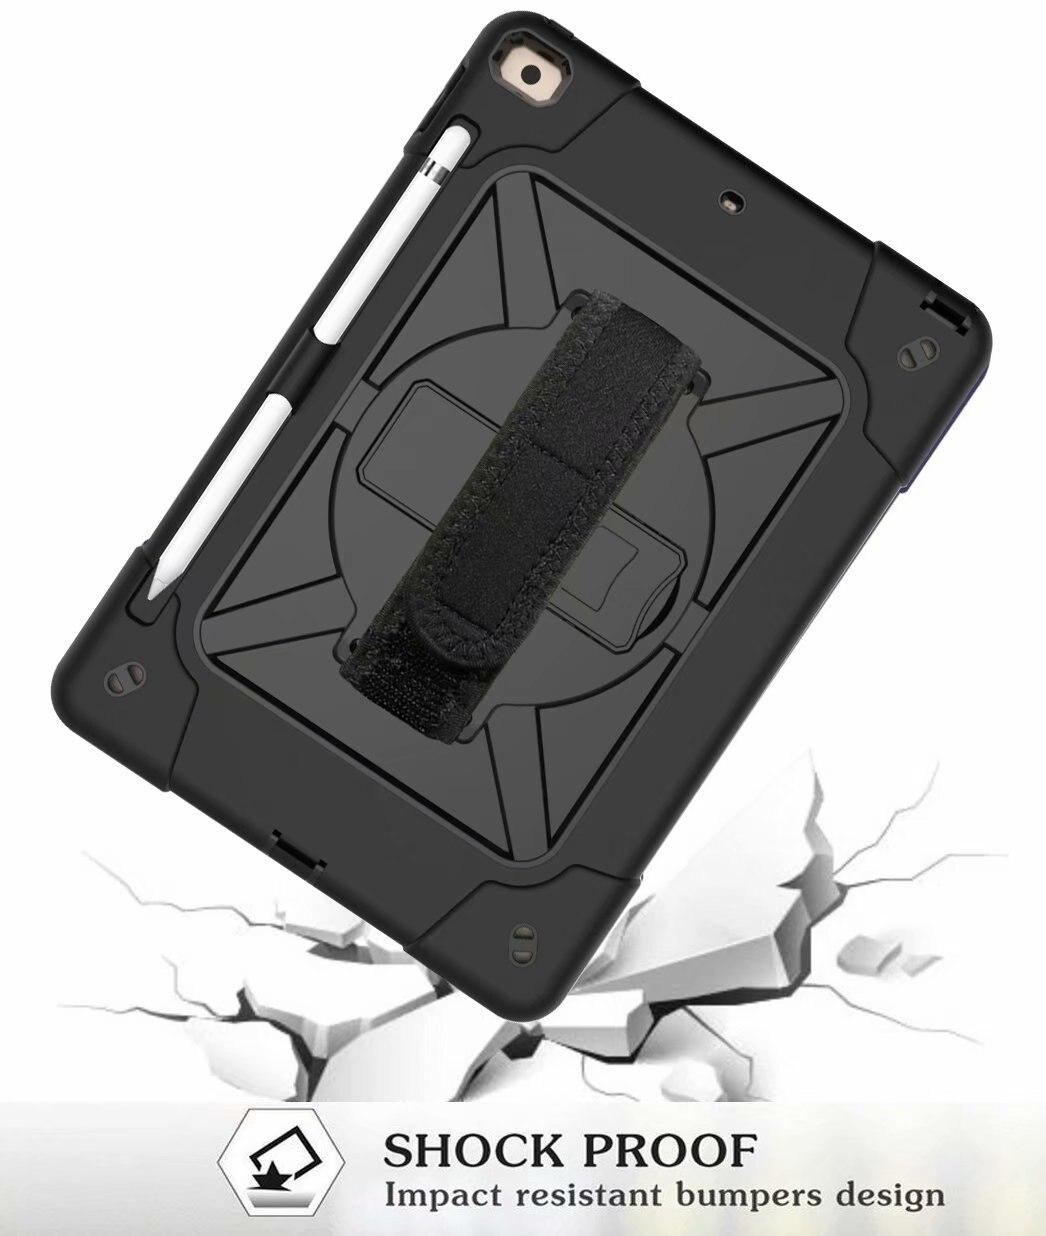 iPad Heavy Rugged 2020 Hybrid Armor Pencil 8th Holder Duty For Shockproof Generation Case